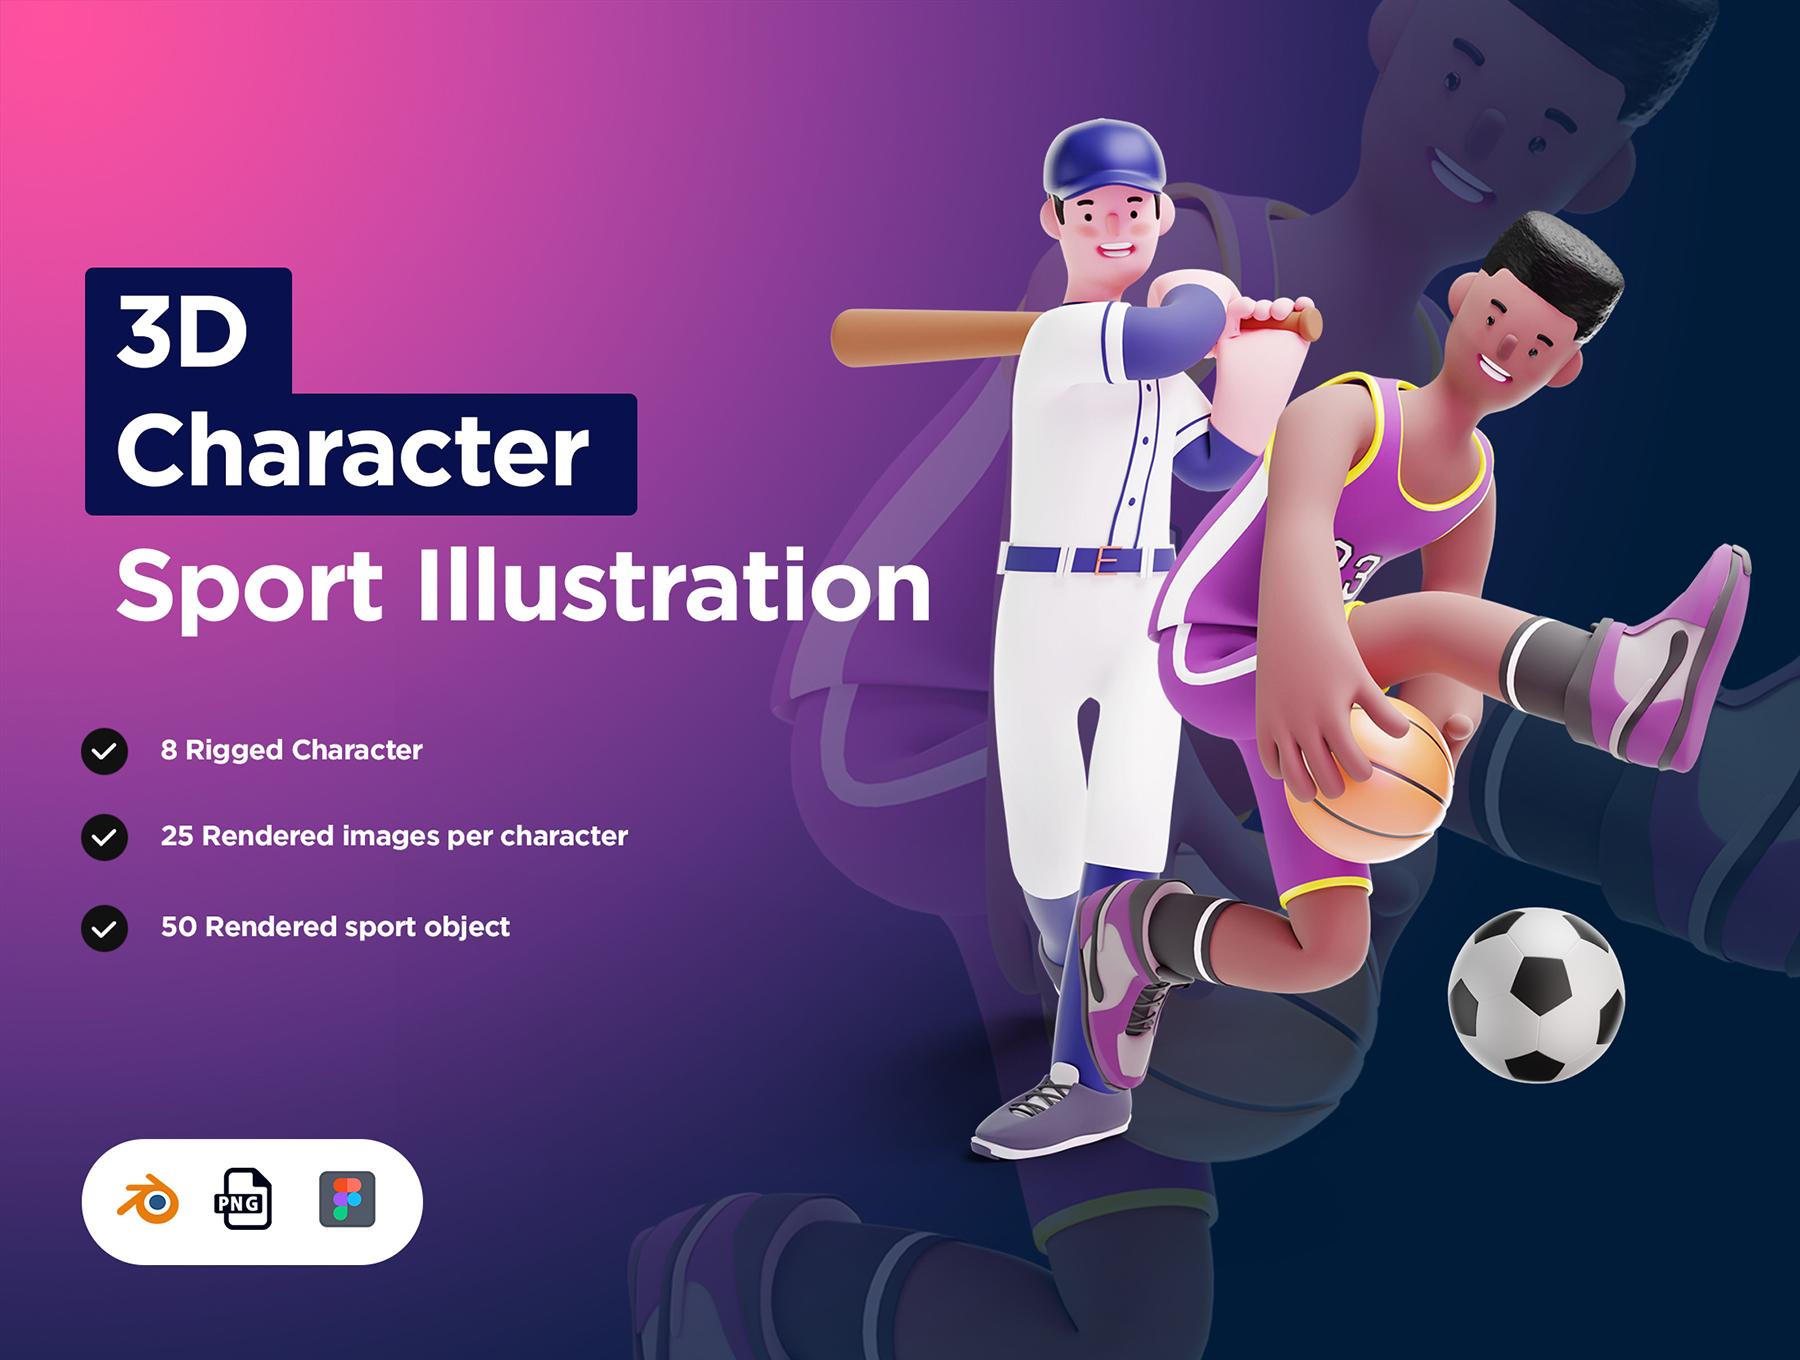 [VIP] 3D Character Pack Sport Illustration & 3D Elements object